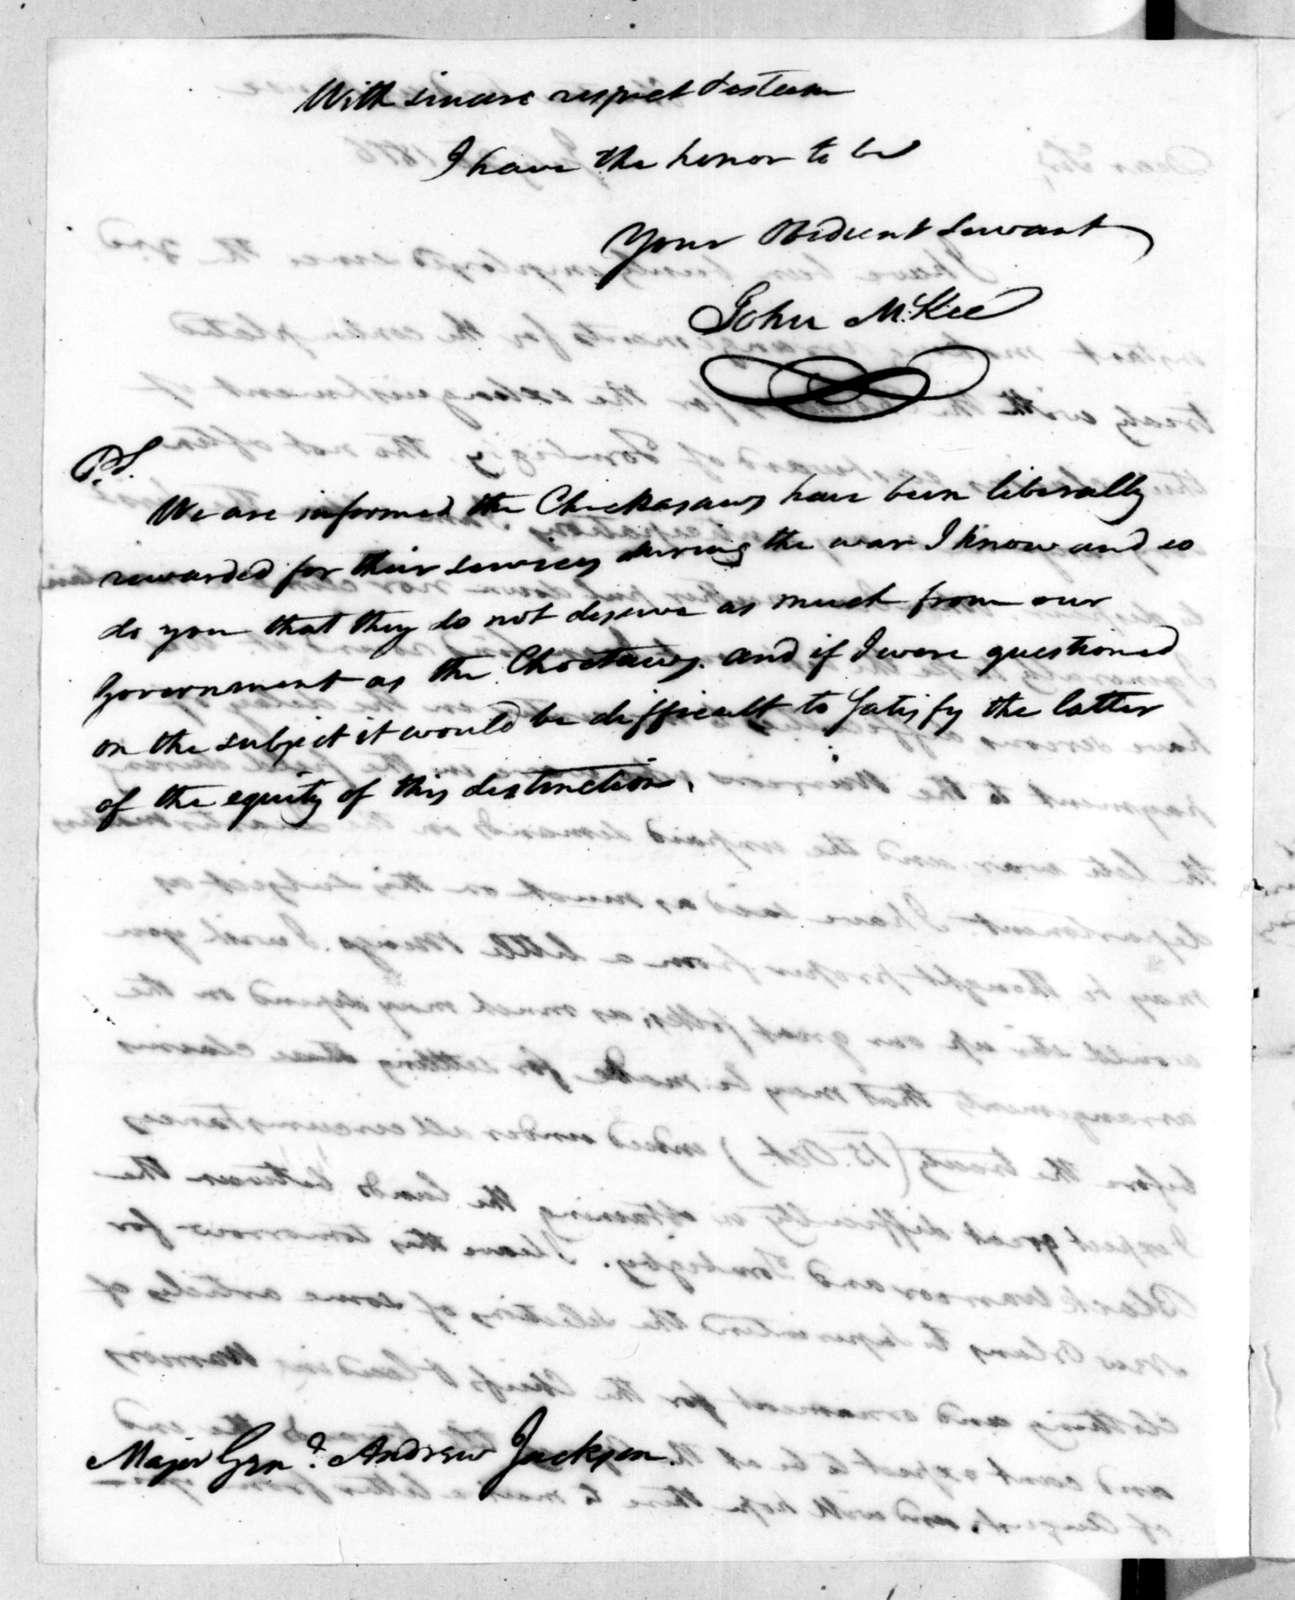 John McKee to Andrew Jackson, July 20, 1816